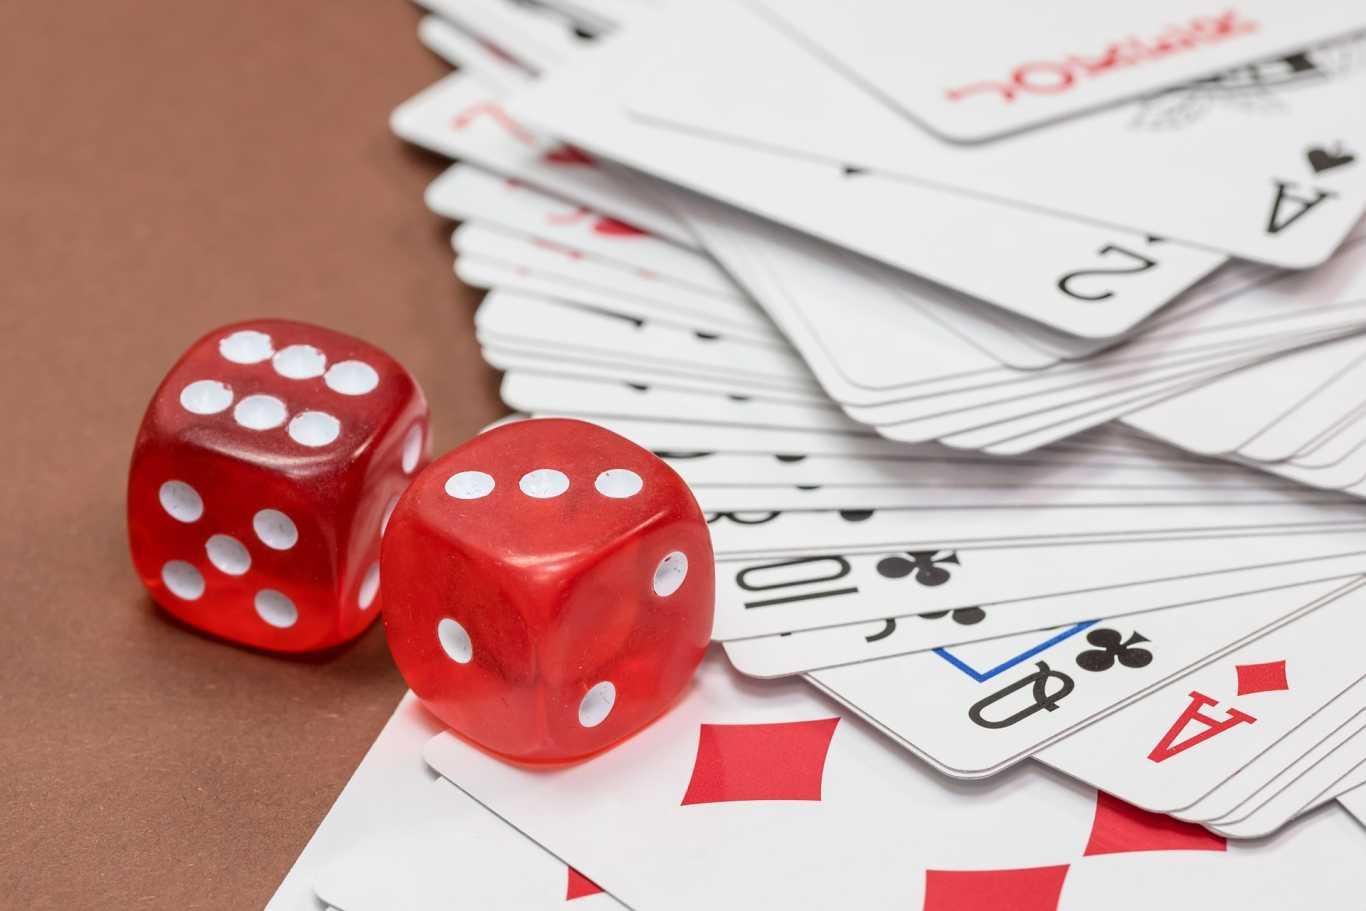 Betclic poker app